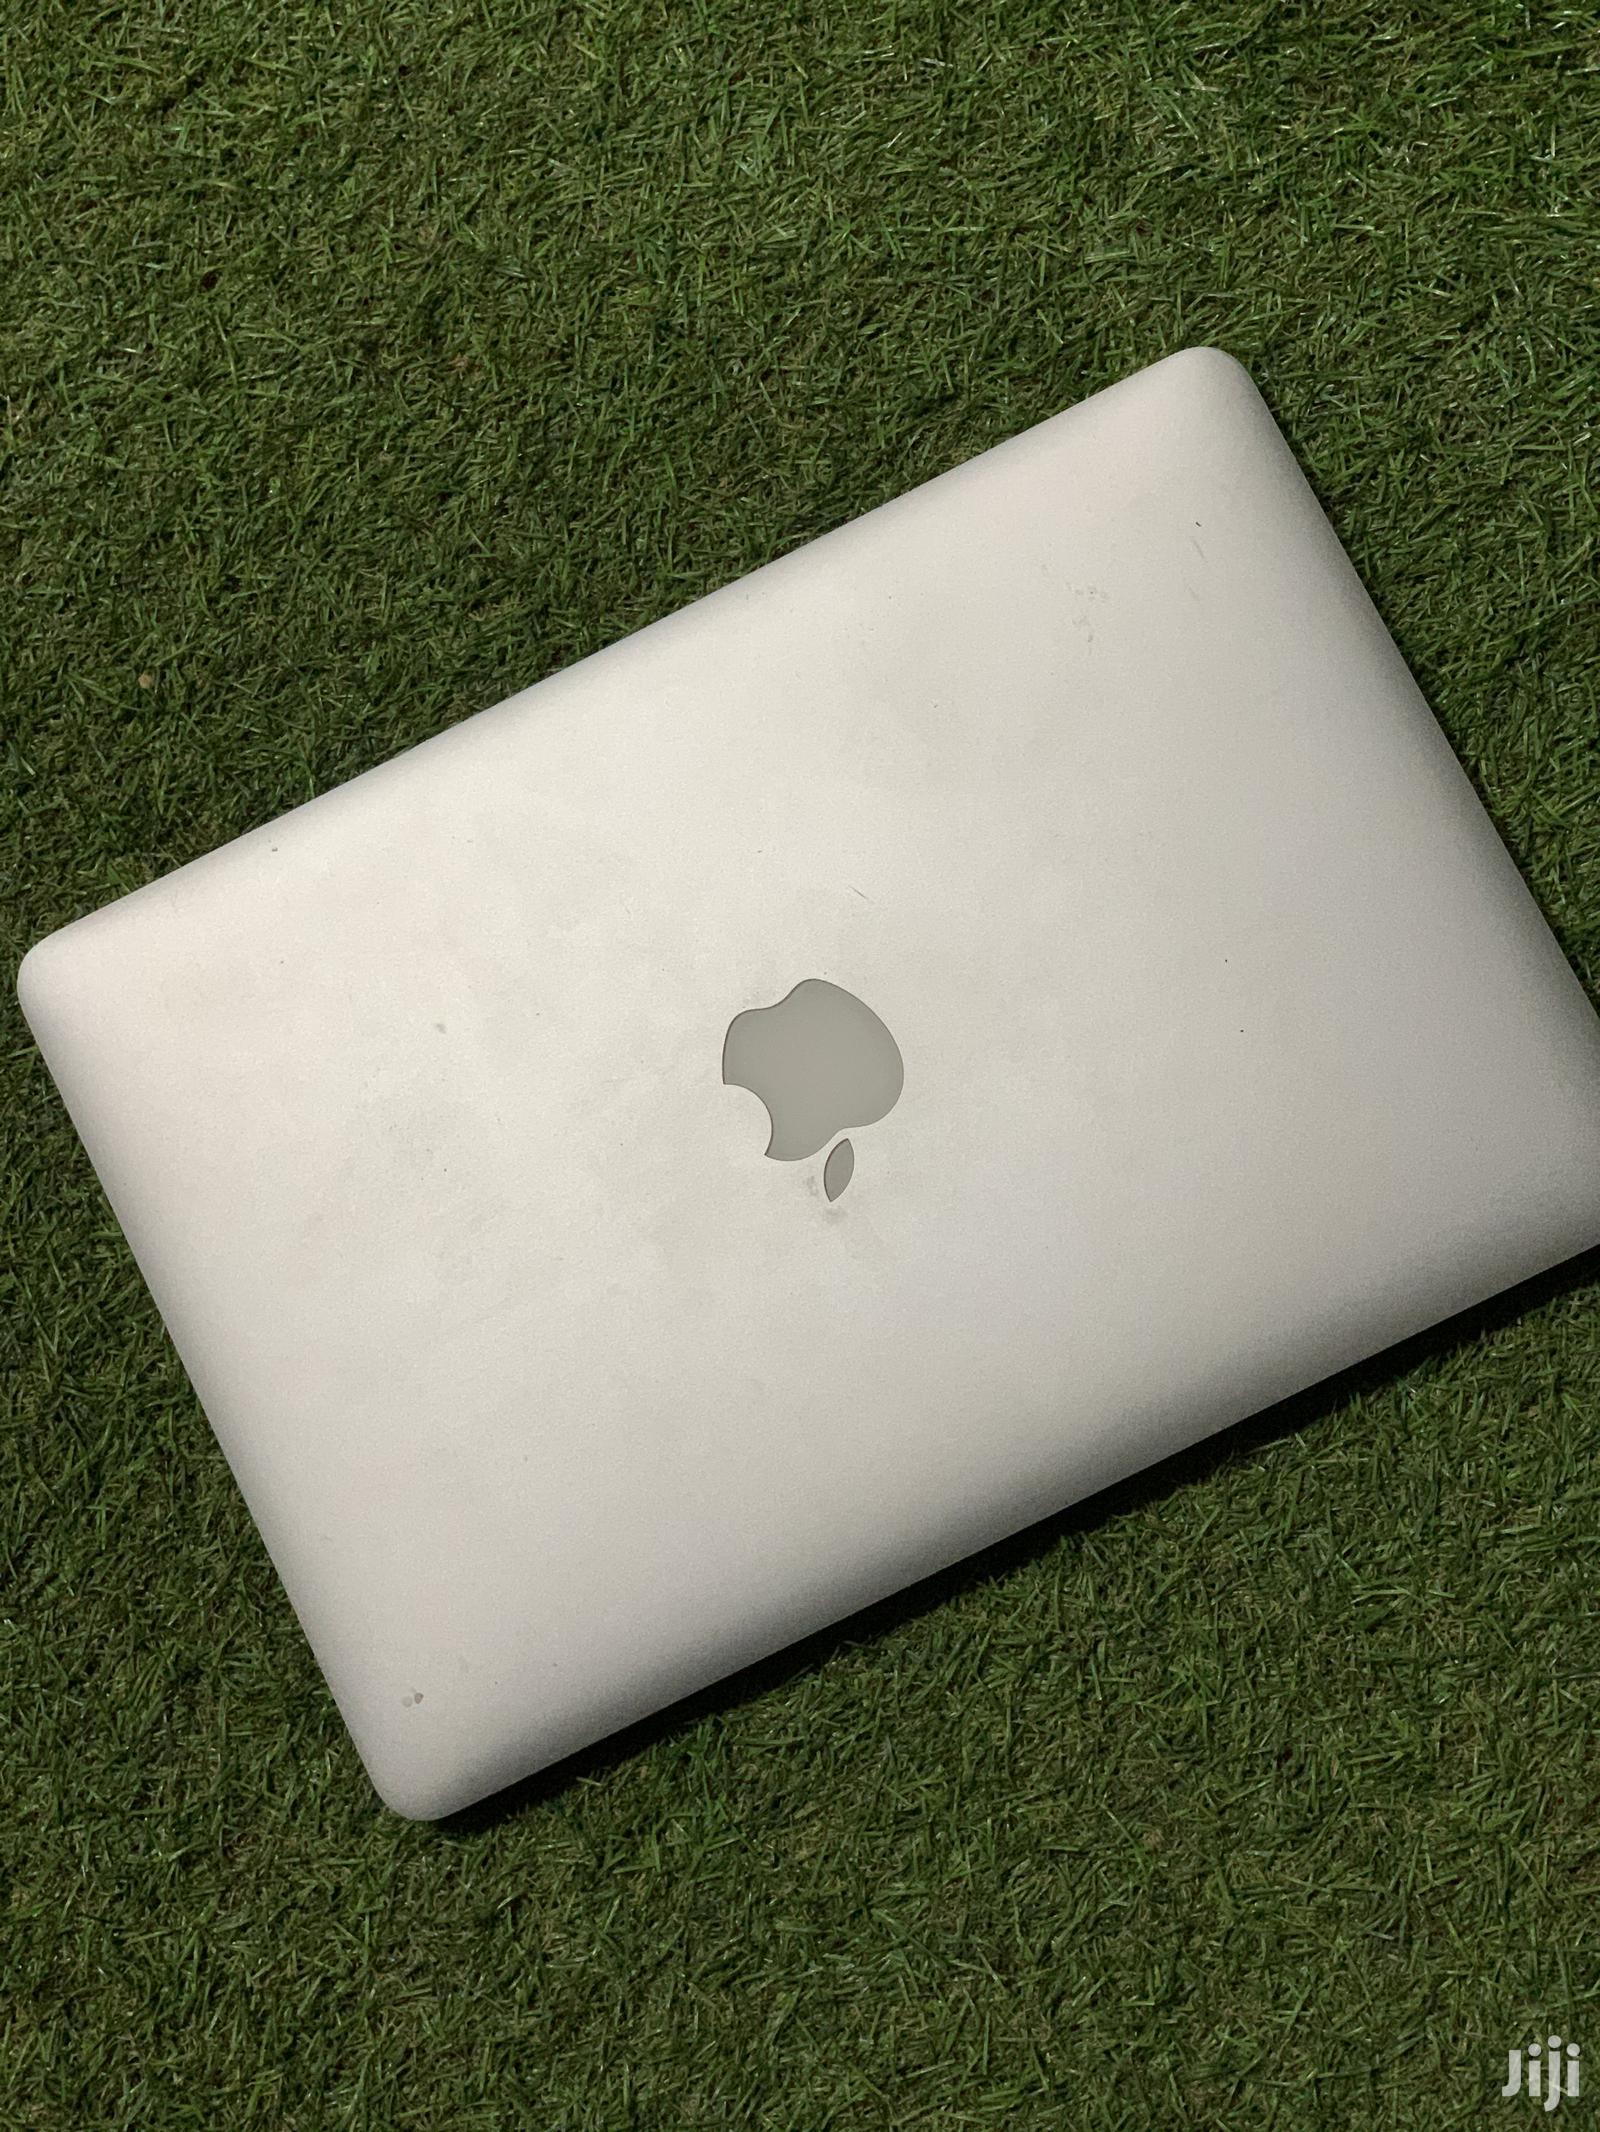 Archive: Laptop Apple MacBook Pro 8GB Intel Core I5 SSD 256GB